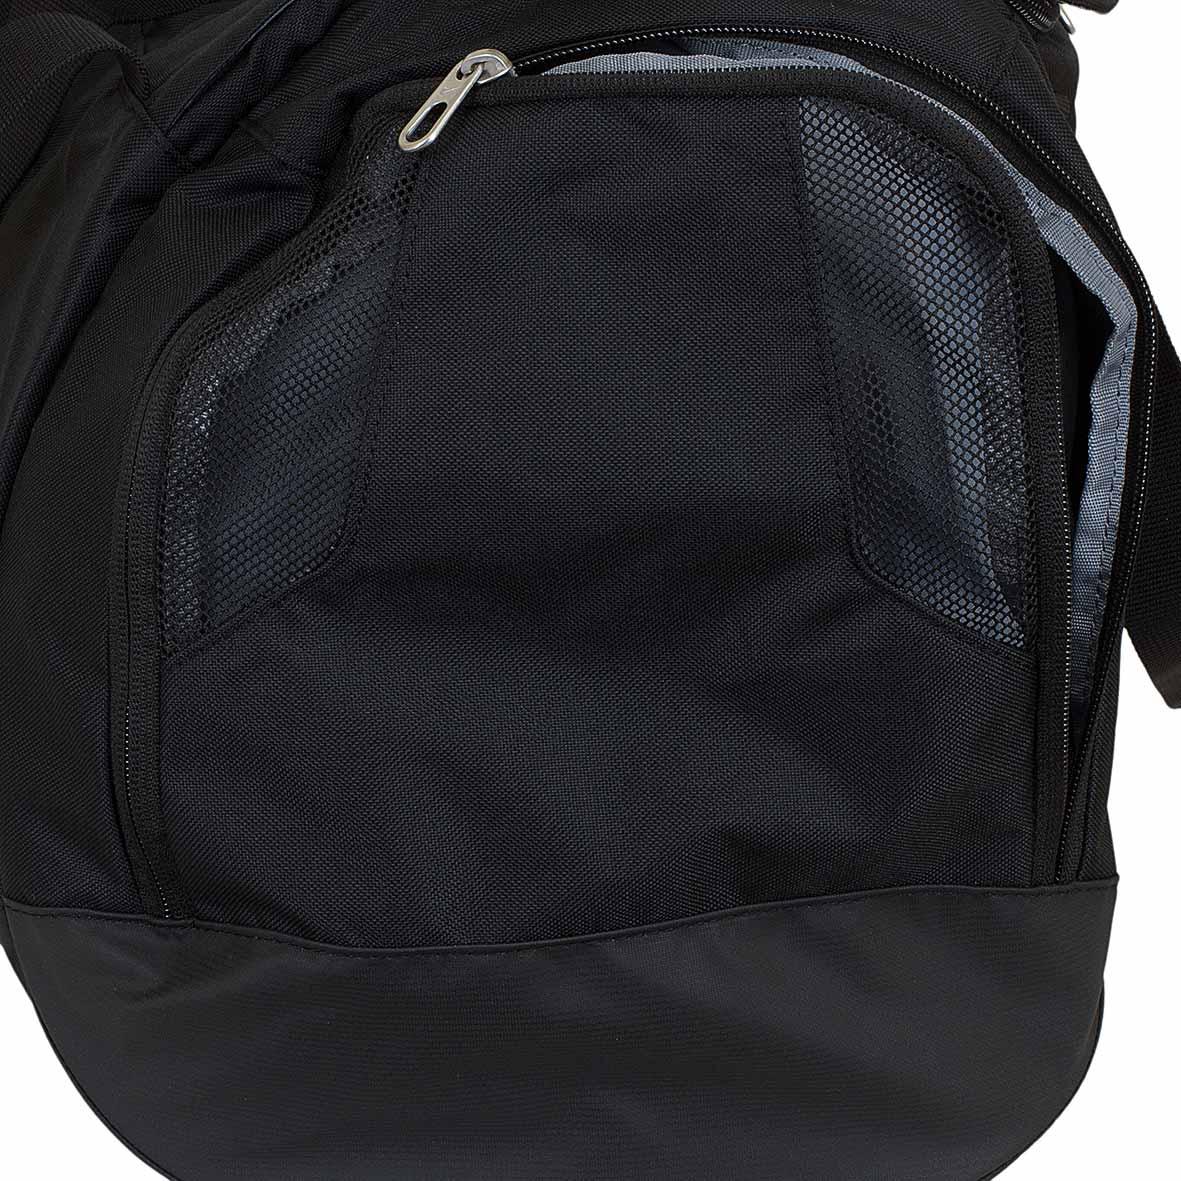 1f36ca2b36f00 ☆ Nike Tasche Club Team Duffel Small schwarz weiß - hier bestellen!